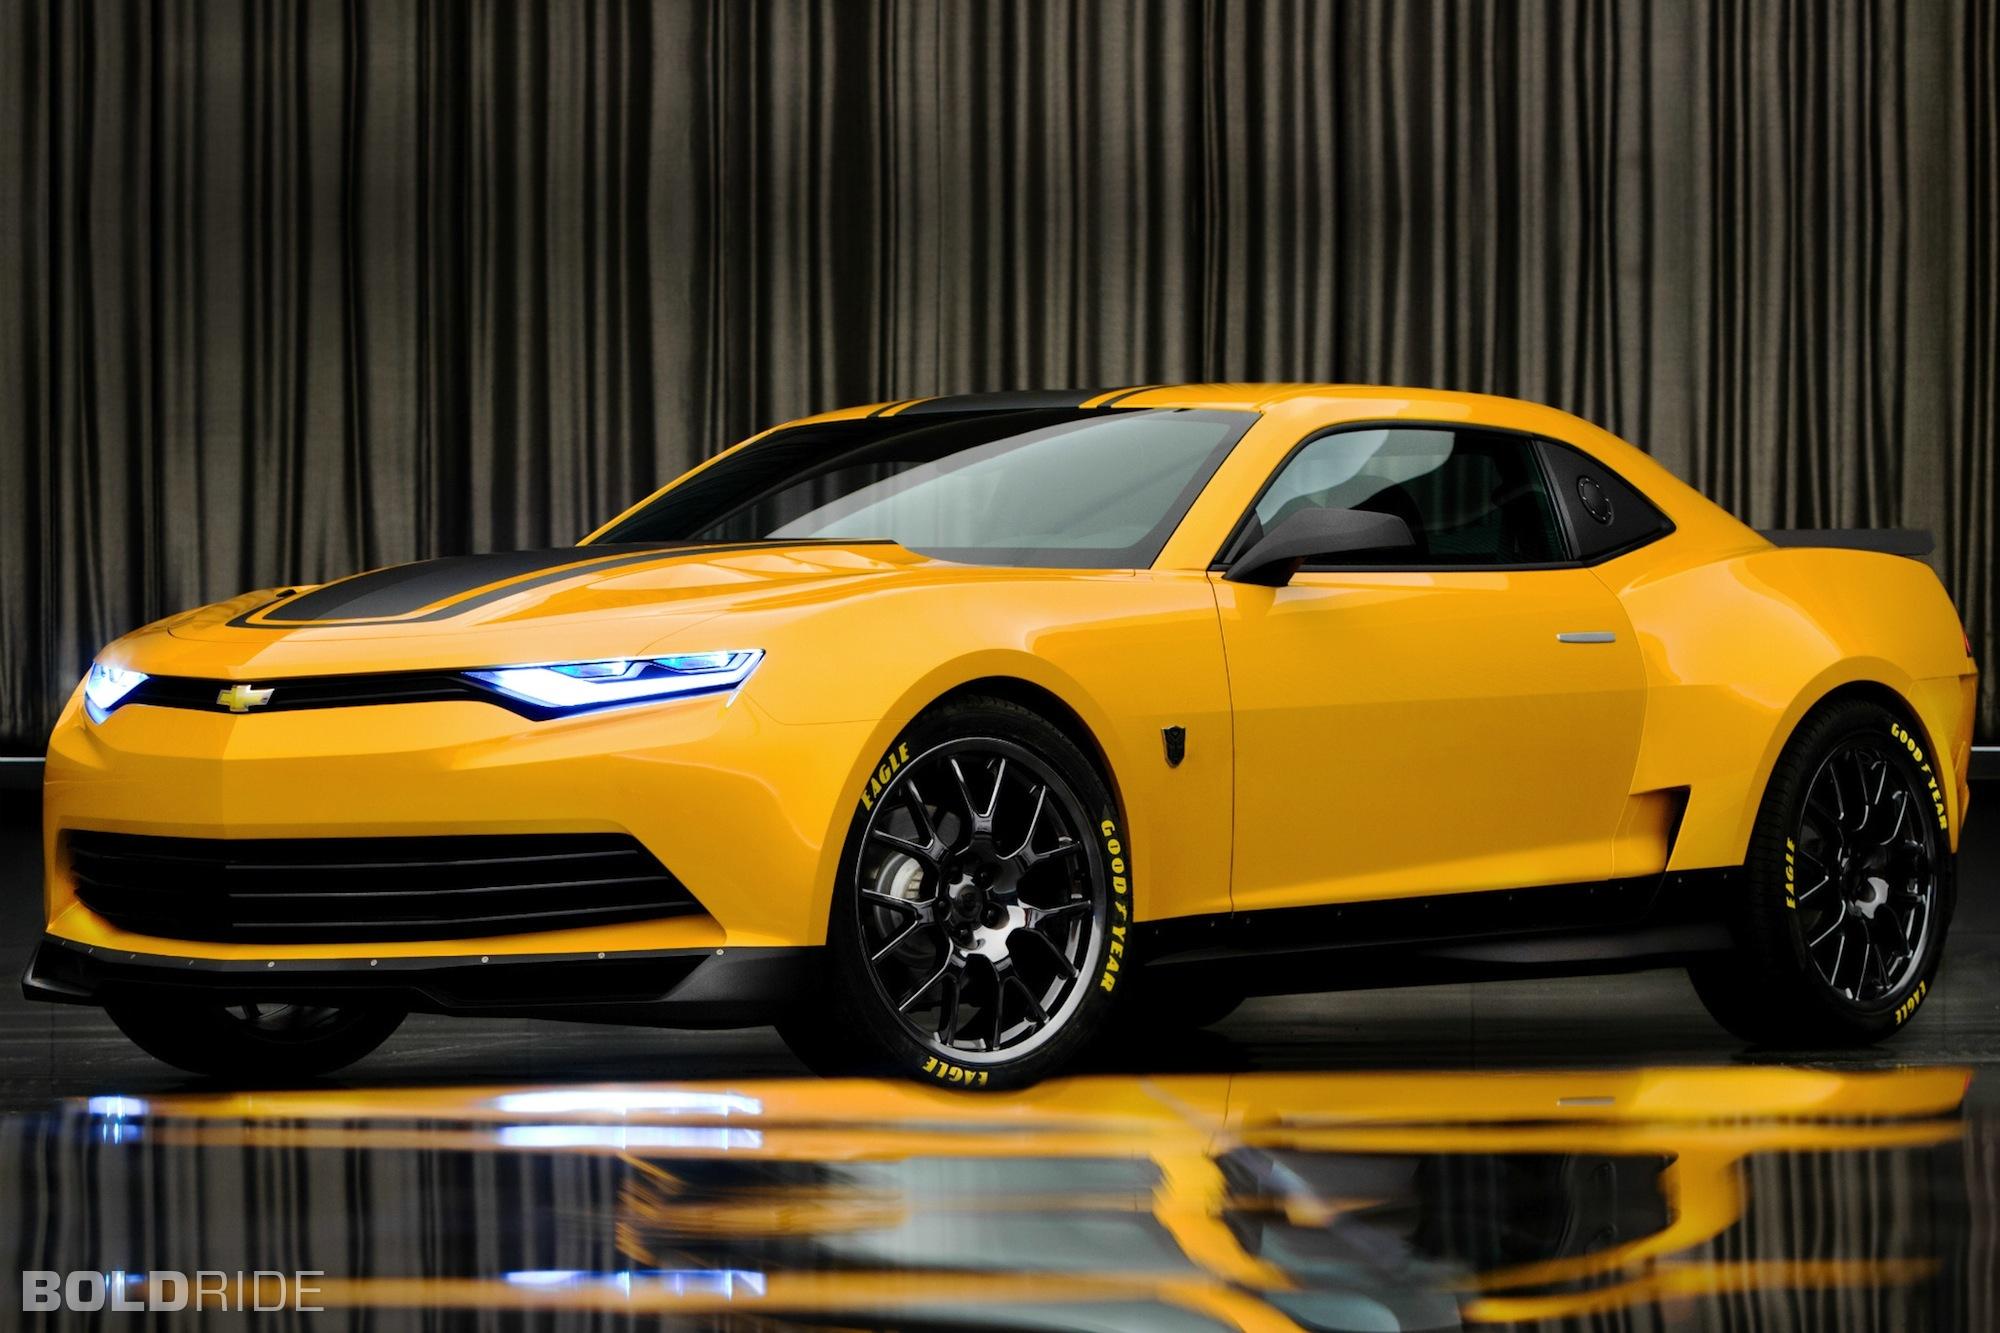 2014 Chevrolet Camaro Bumblebee Concept 1600 x 1200